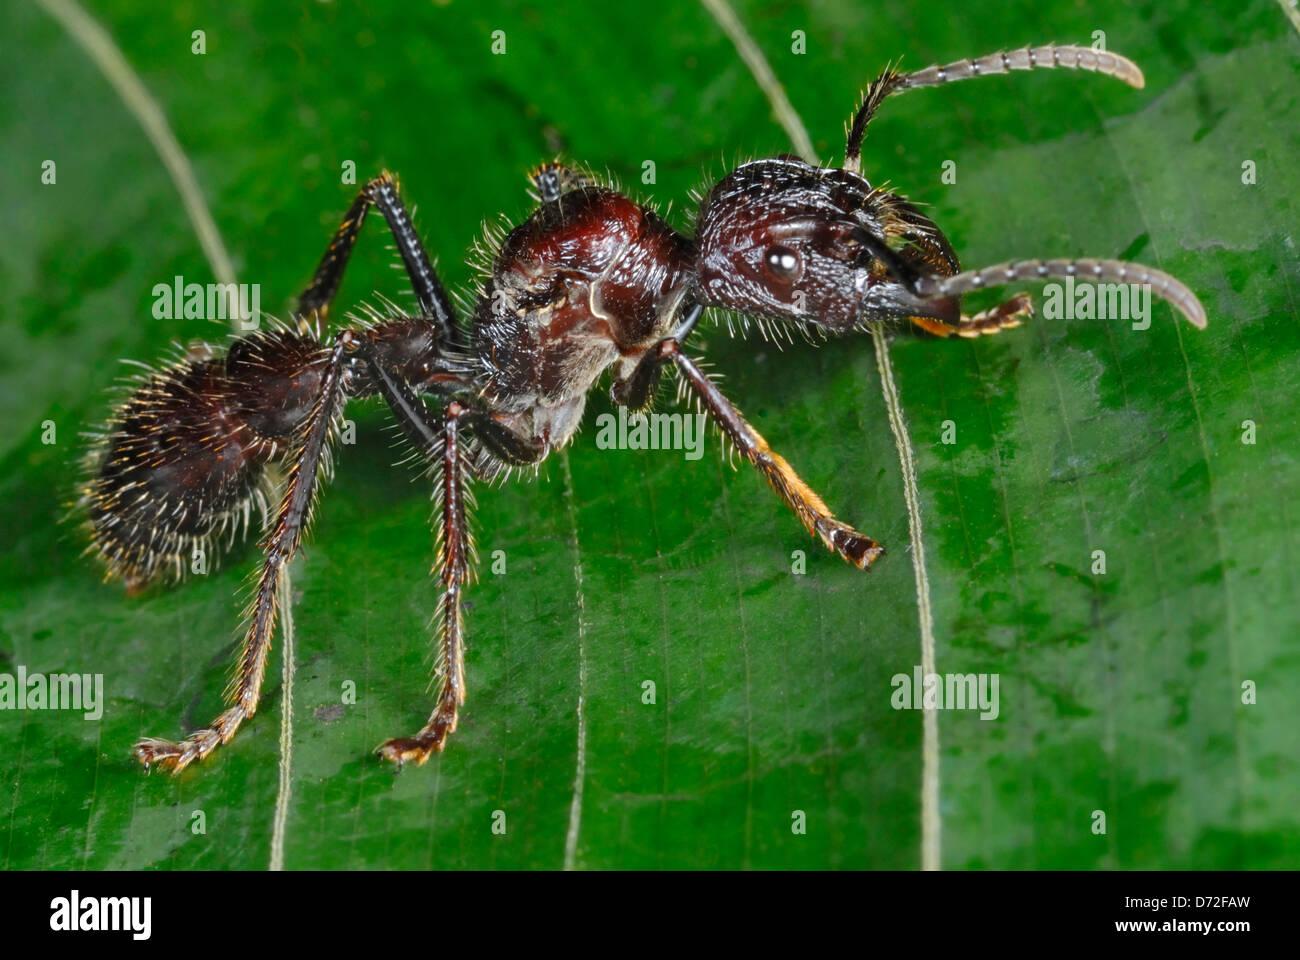 Enorme Bullet Ant (Paraponeragroße Clavata) im Regenwald von Costa Rica Stockbild